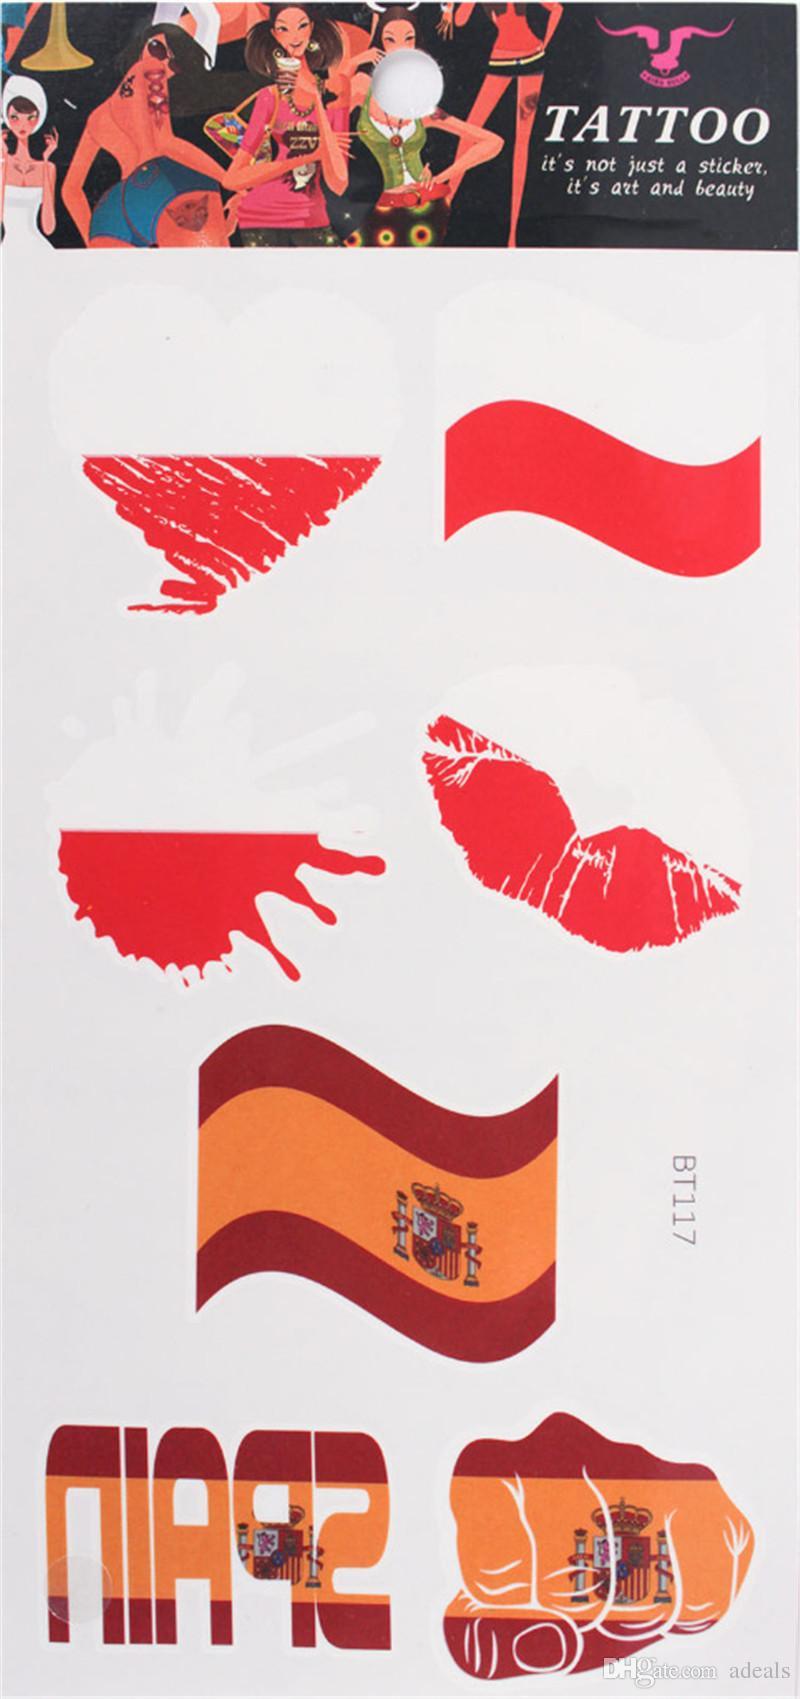 2018 Football Games Flag car Tattoo Stickers World Cup Face Flag Tattoo Of car and Tattoo Sticker